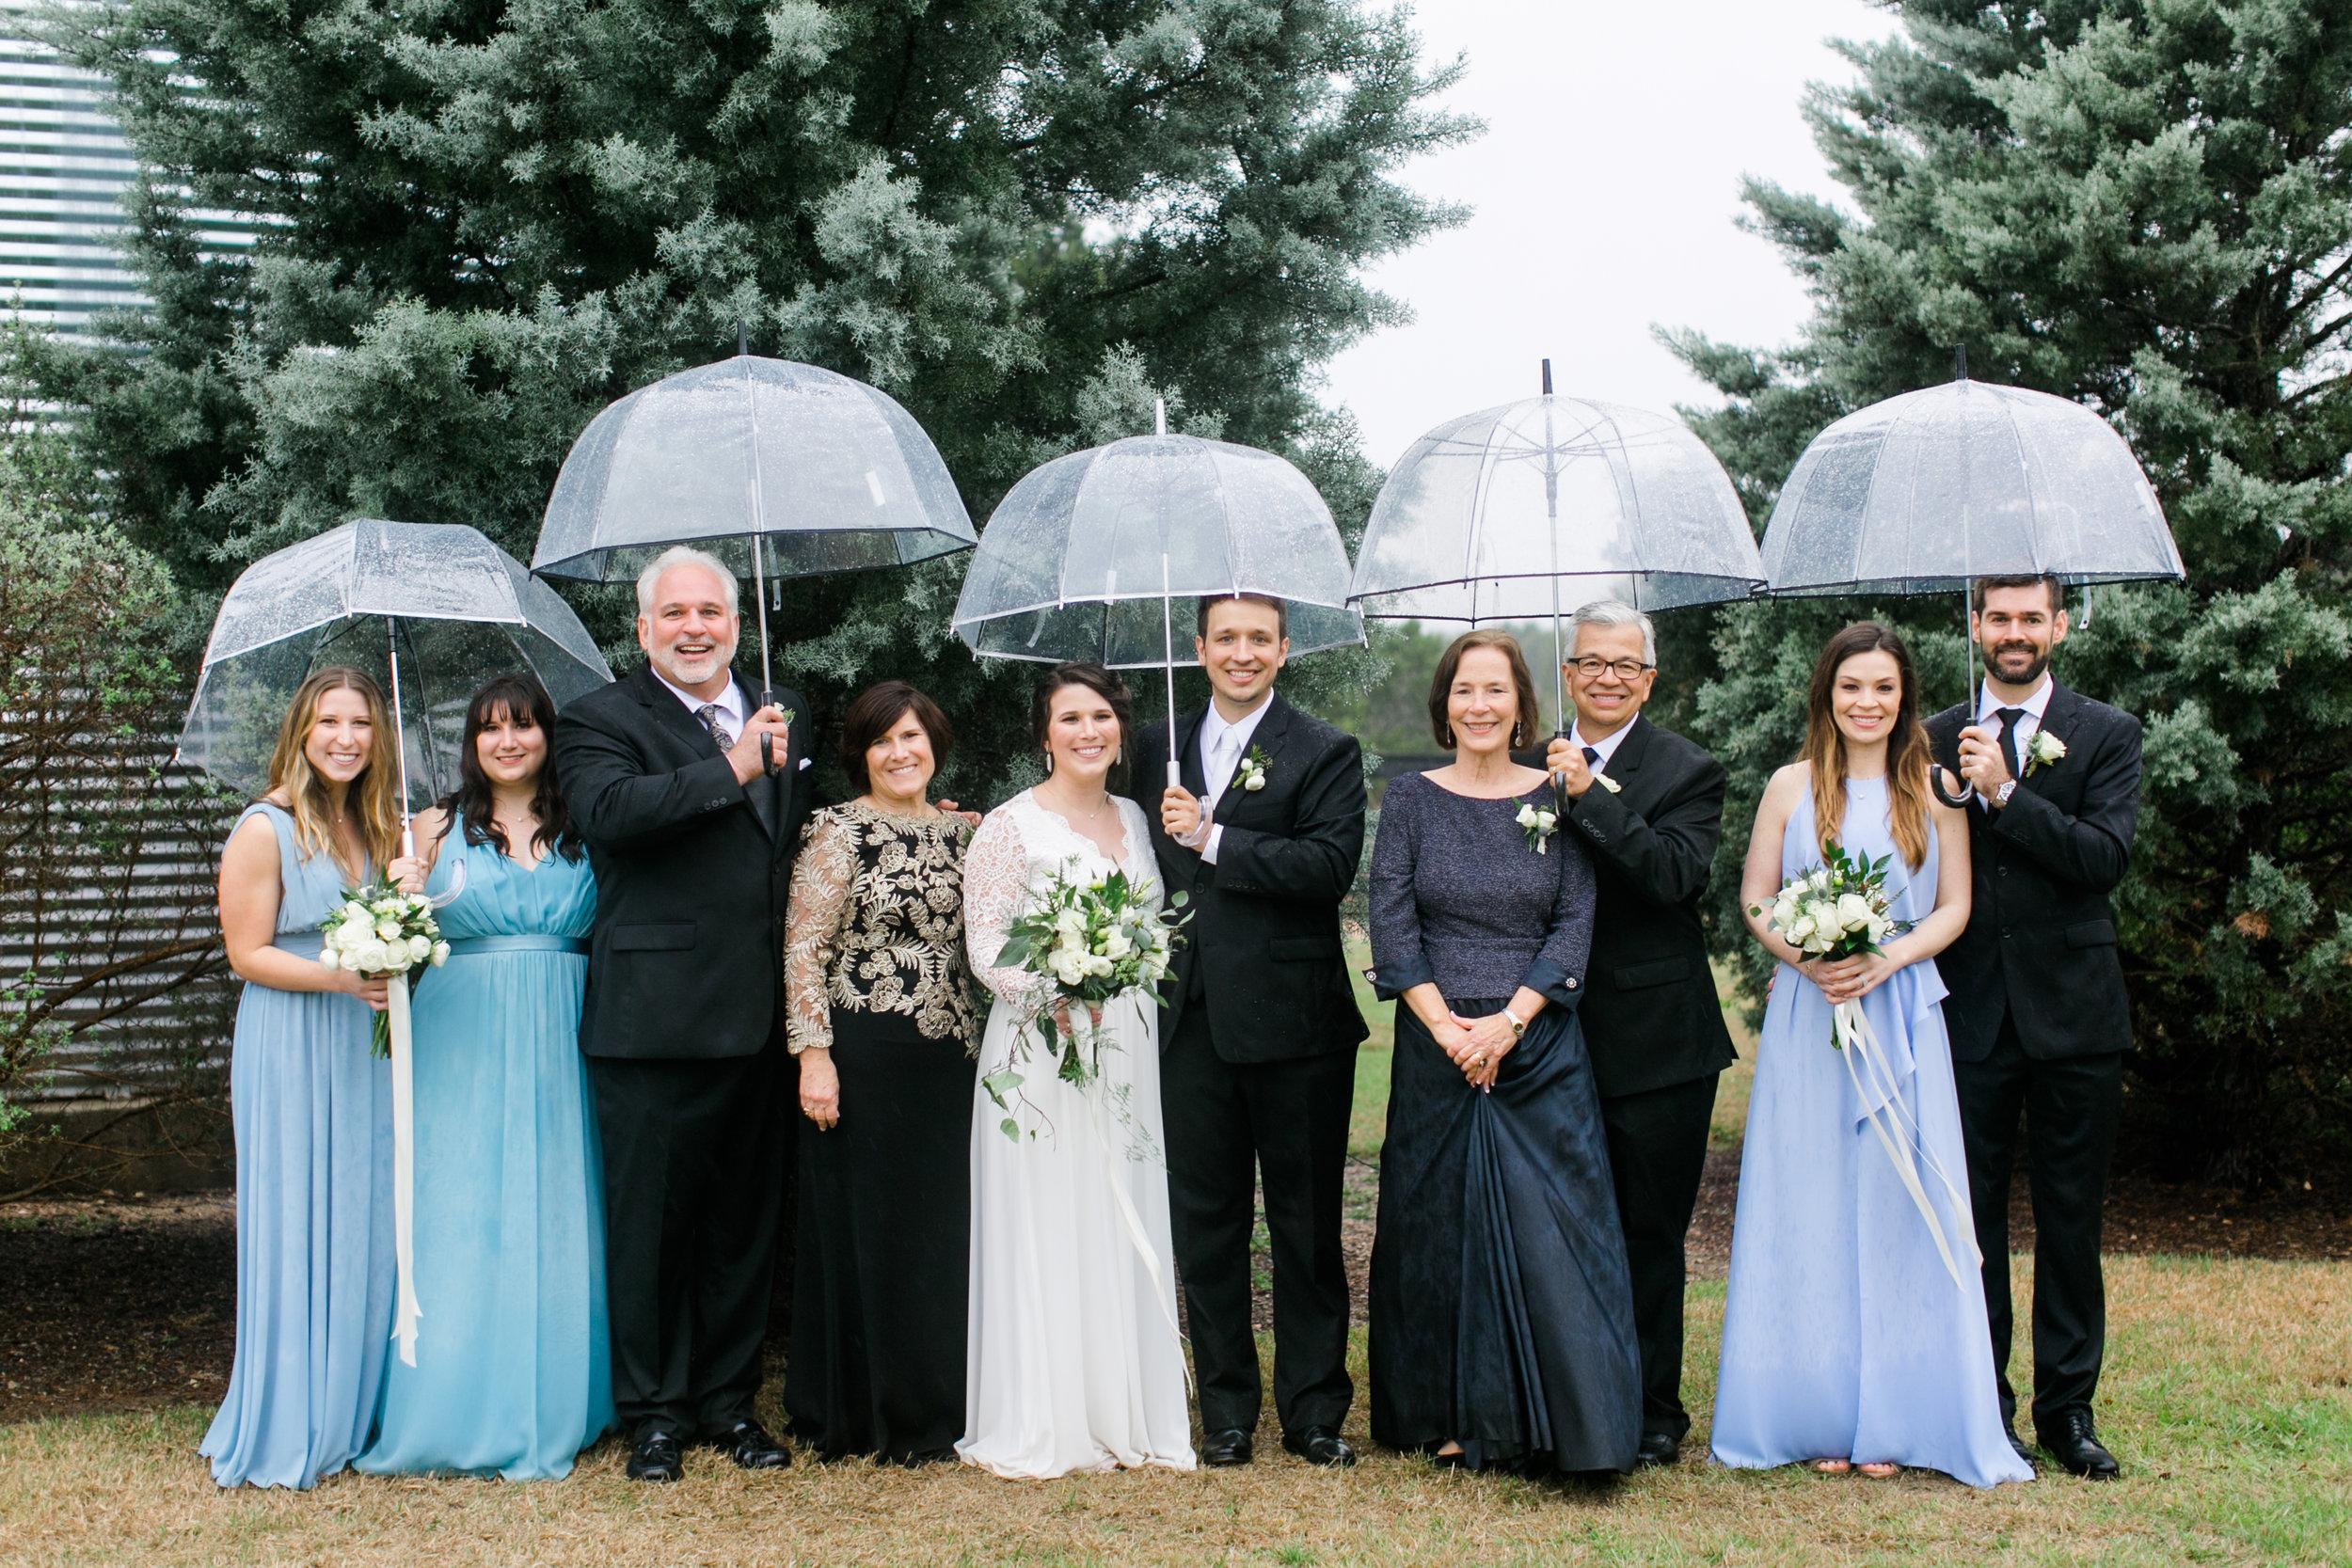 Austin_Texas_Fine_Art_Wedding_Photographer_Kayla_Snell_Photography_Antebellum_Oaks376.jpg